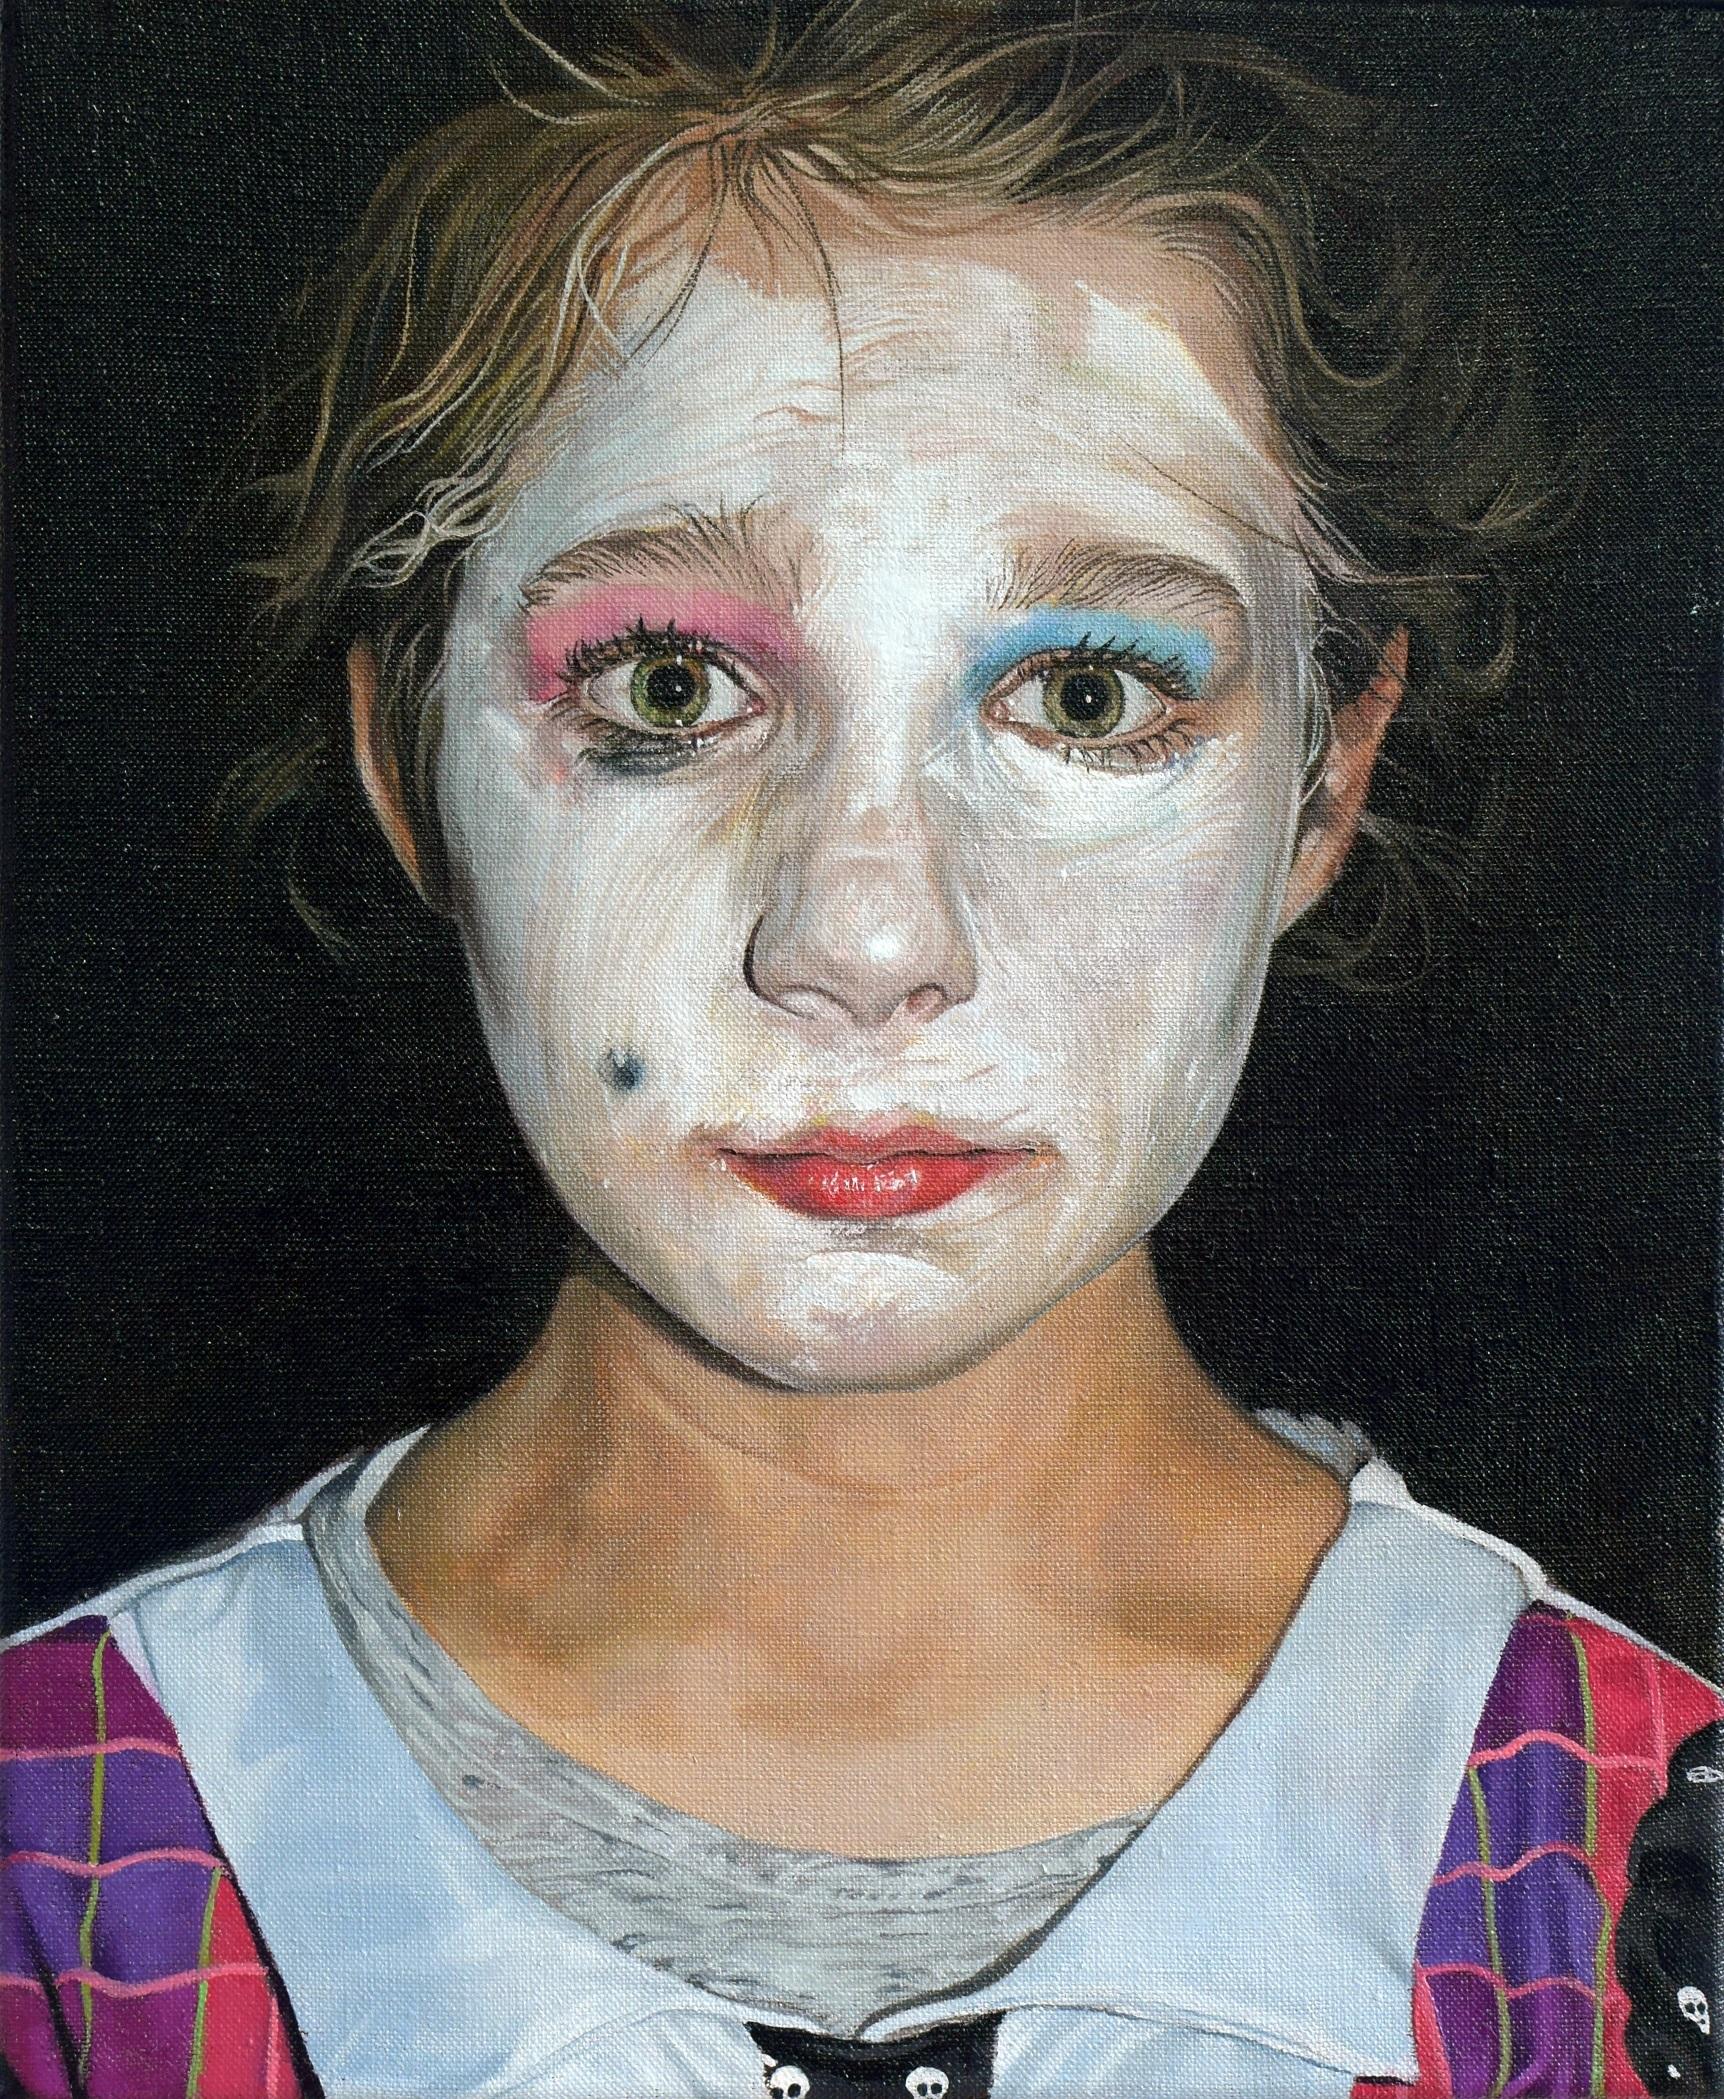 Behind The Doll Face Catherine MacDiarmid Oil on linen, 30 cm x 25 cm